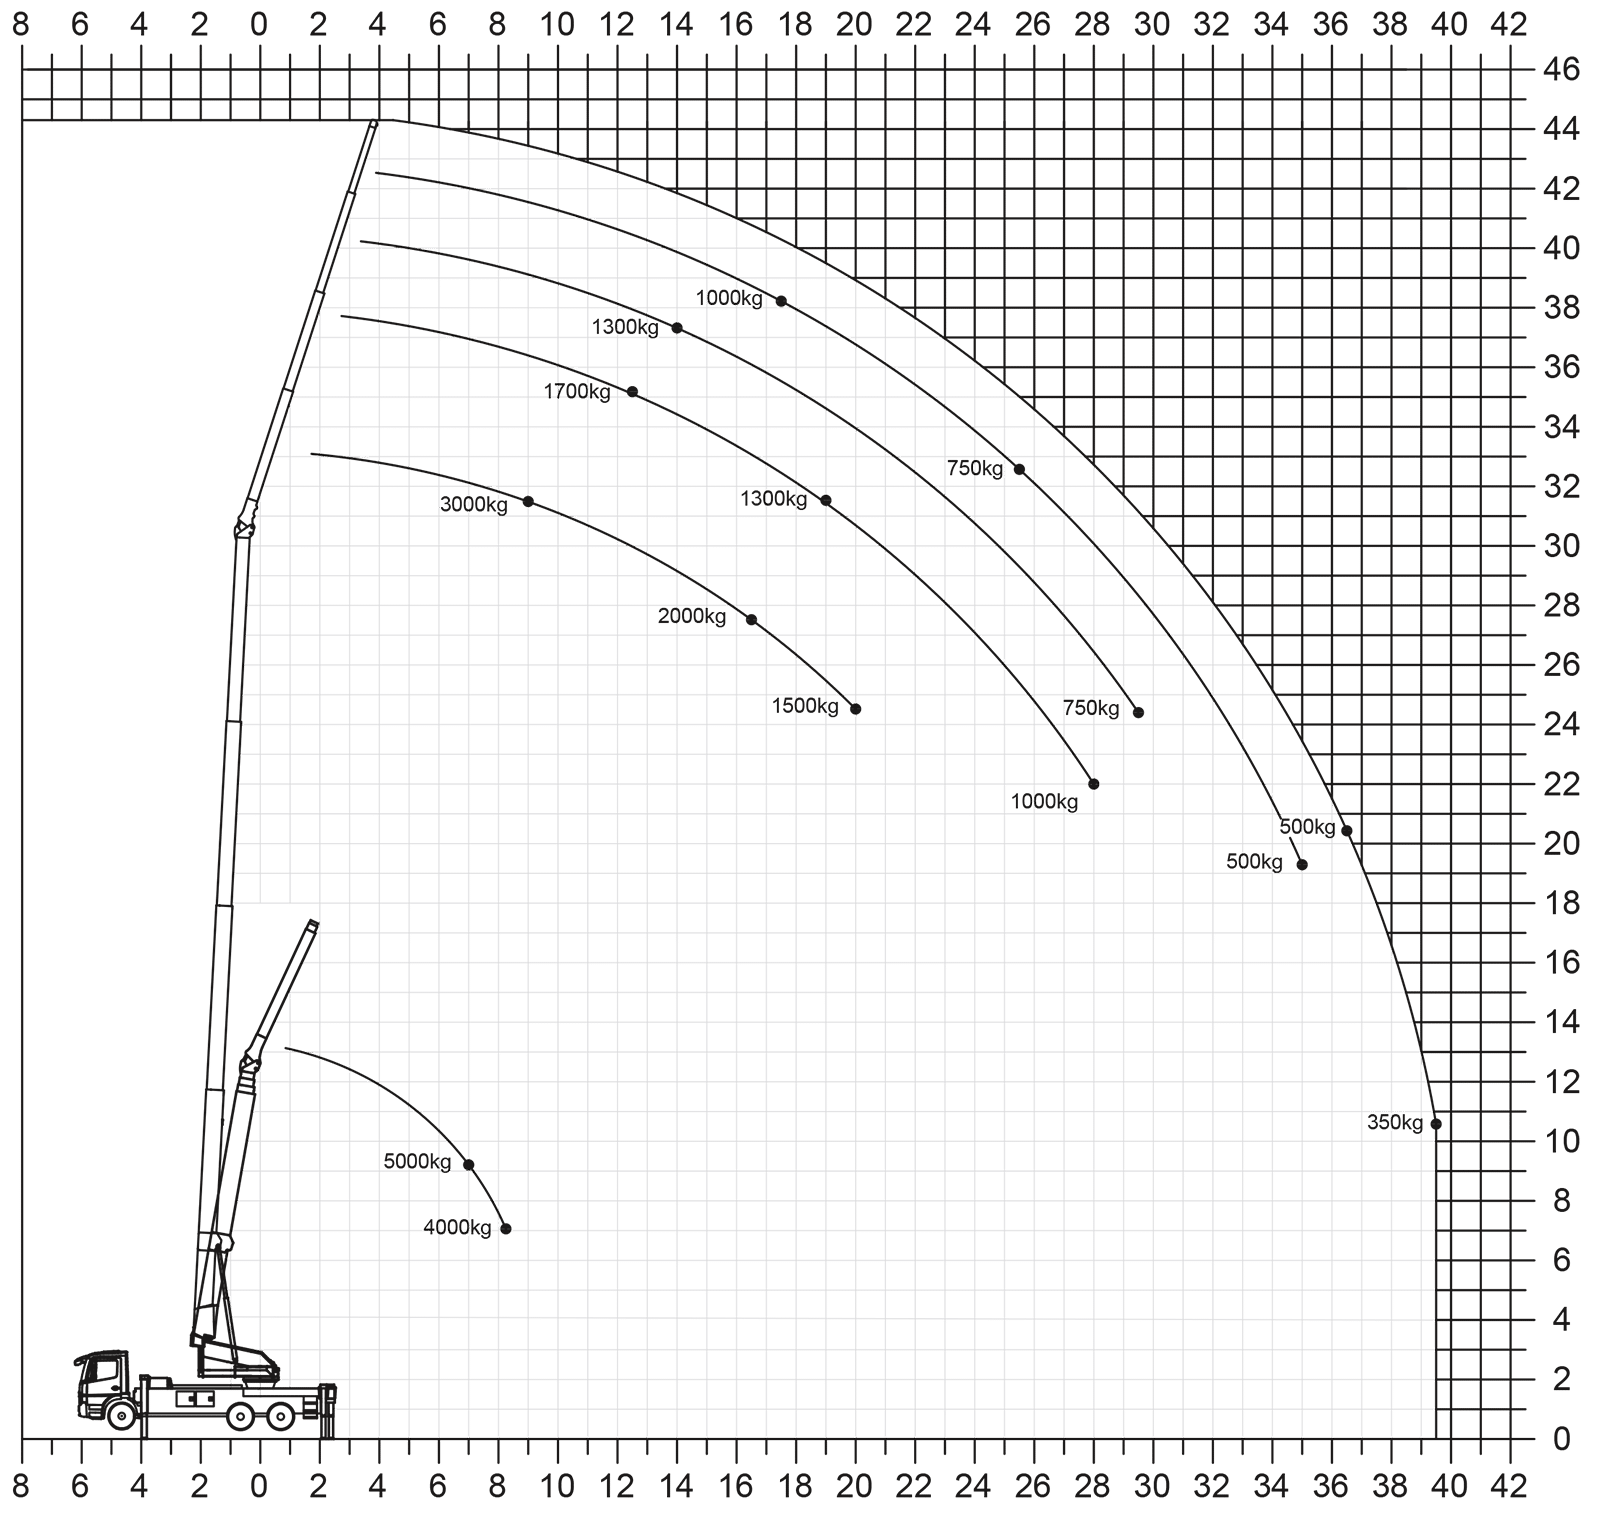 Atemberaubend Lcd Kabel Diagramm Fotos - Der Schaltplan - greigo.com